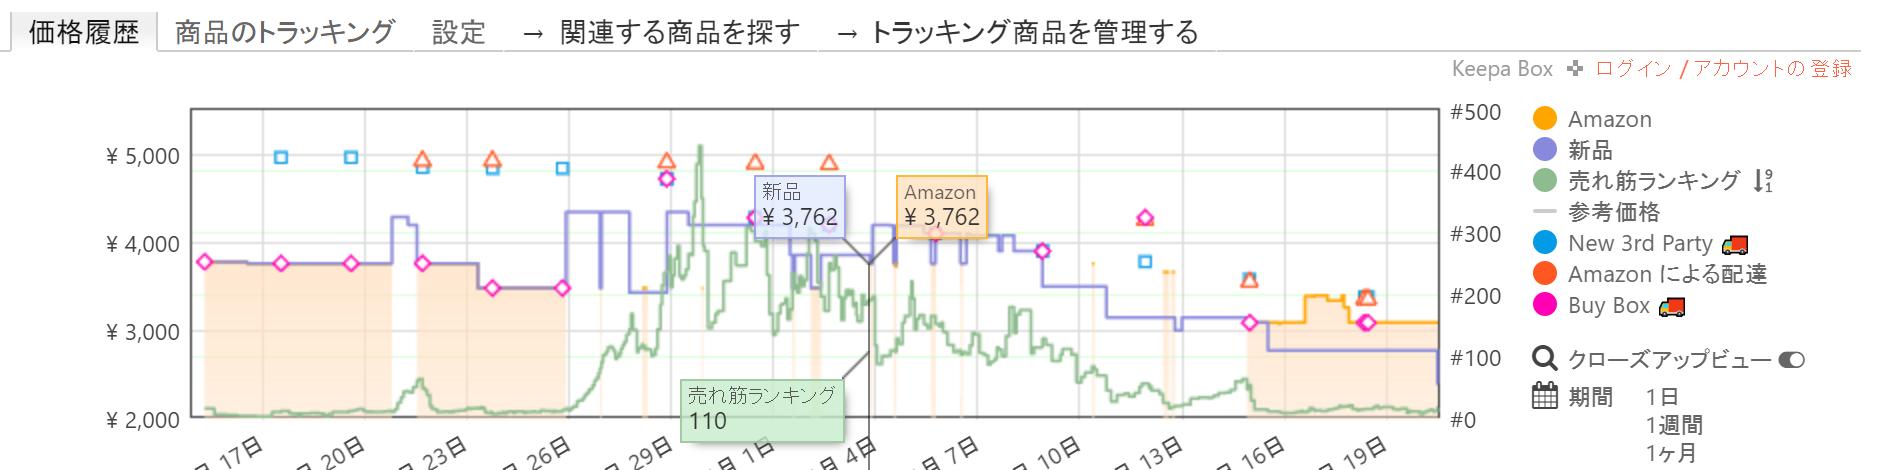 2016-11-20_12h20_56